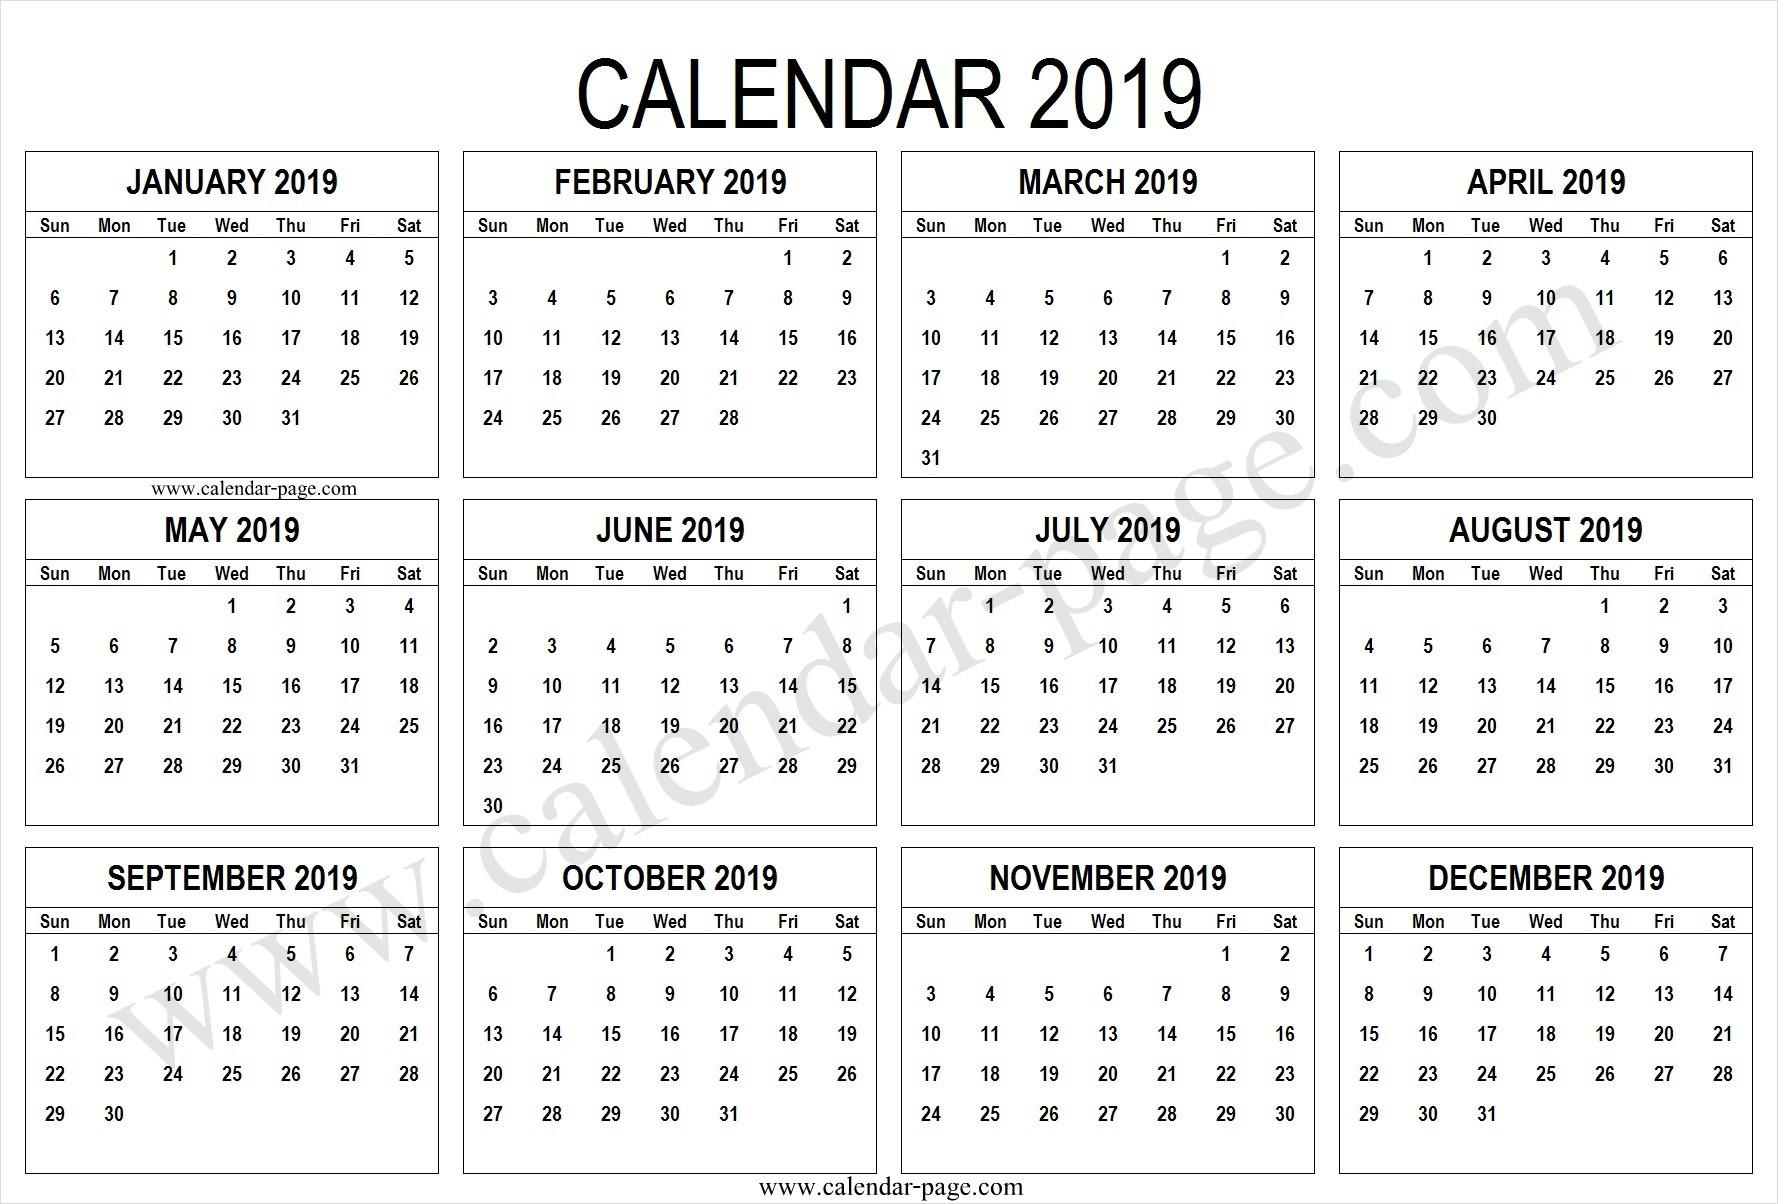 2019 January Calendar Template and 2019 Printable Calendar Pages